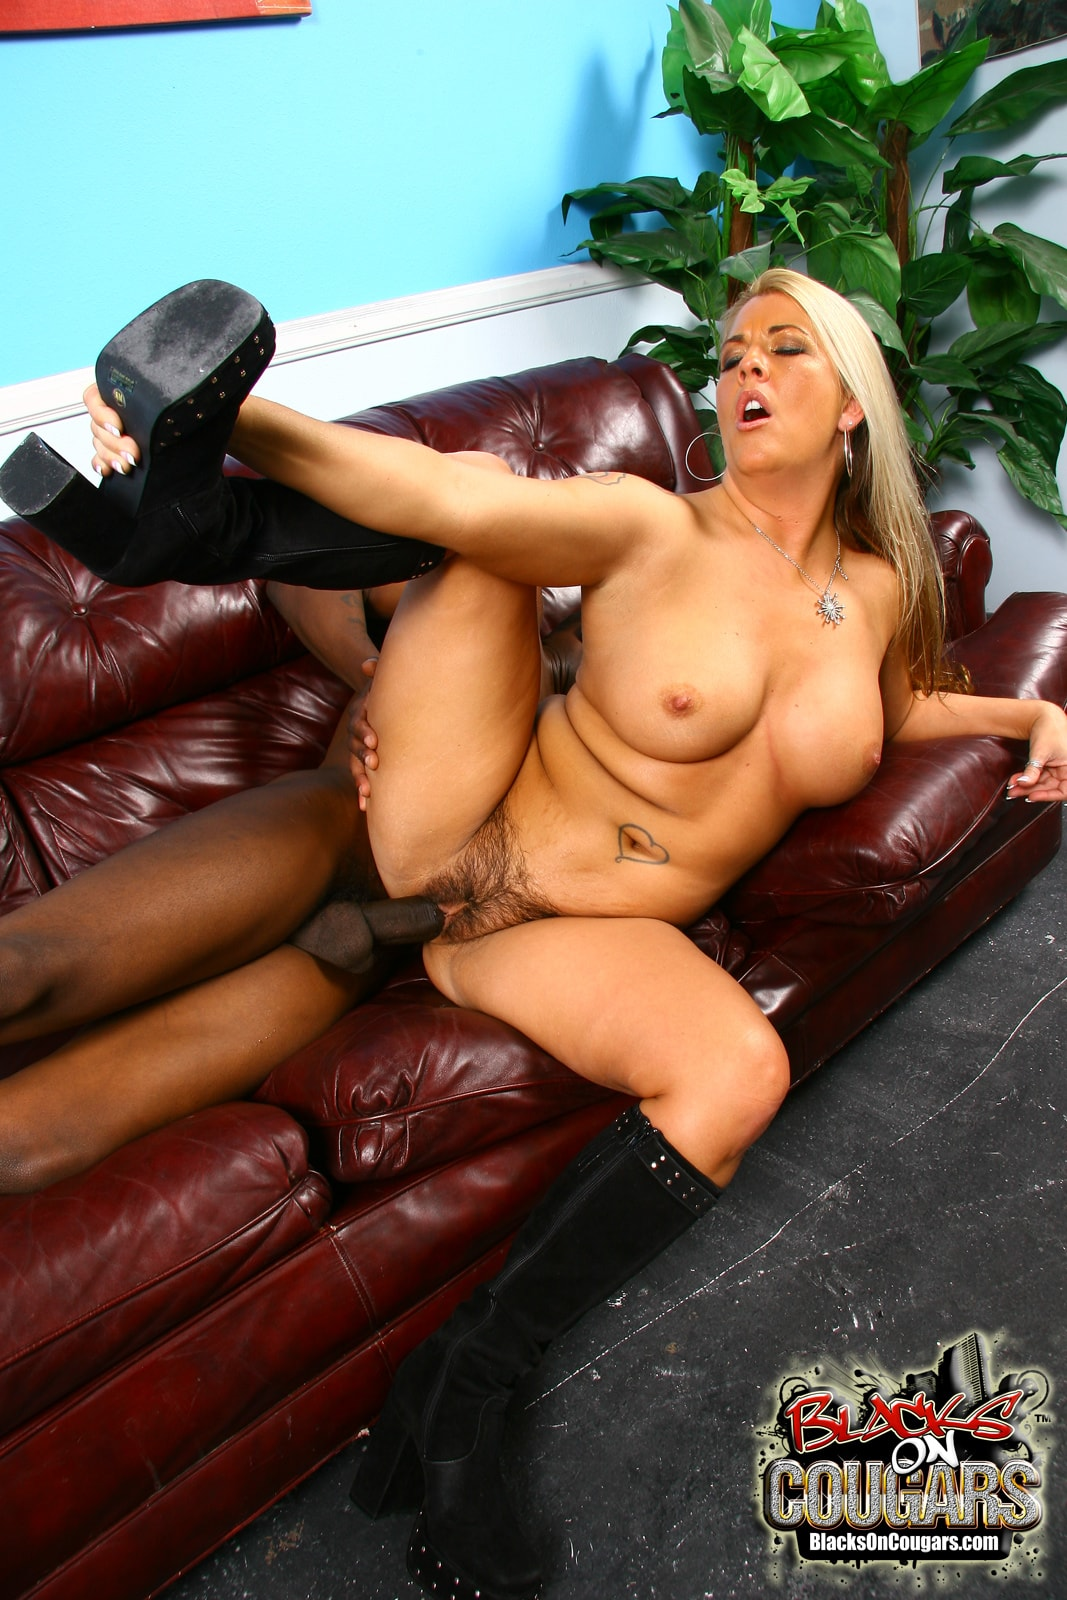 Dogfart '- Blacks On Cougars' starring Joclyn Stone (Photo 28)